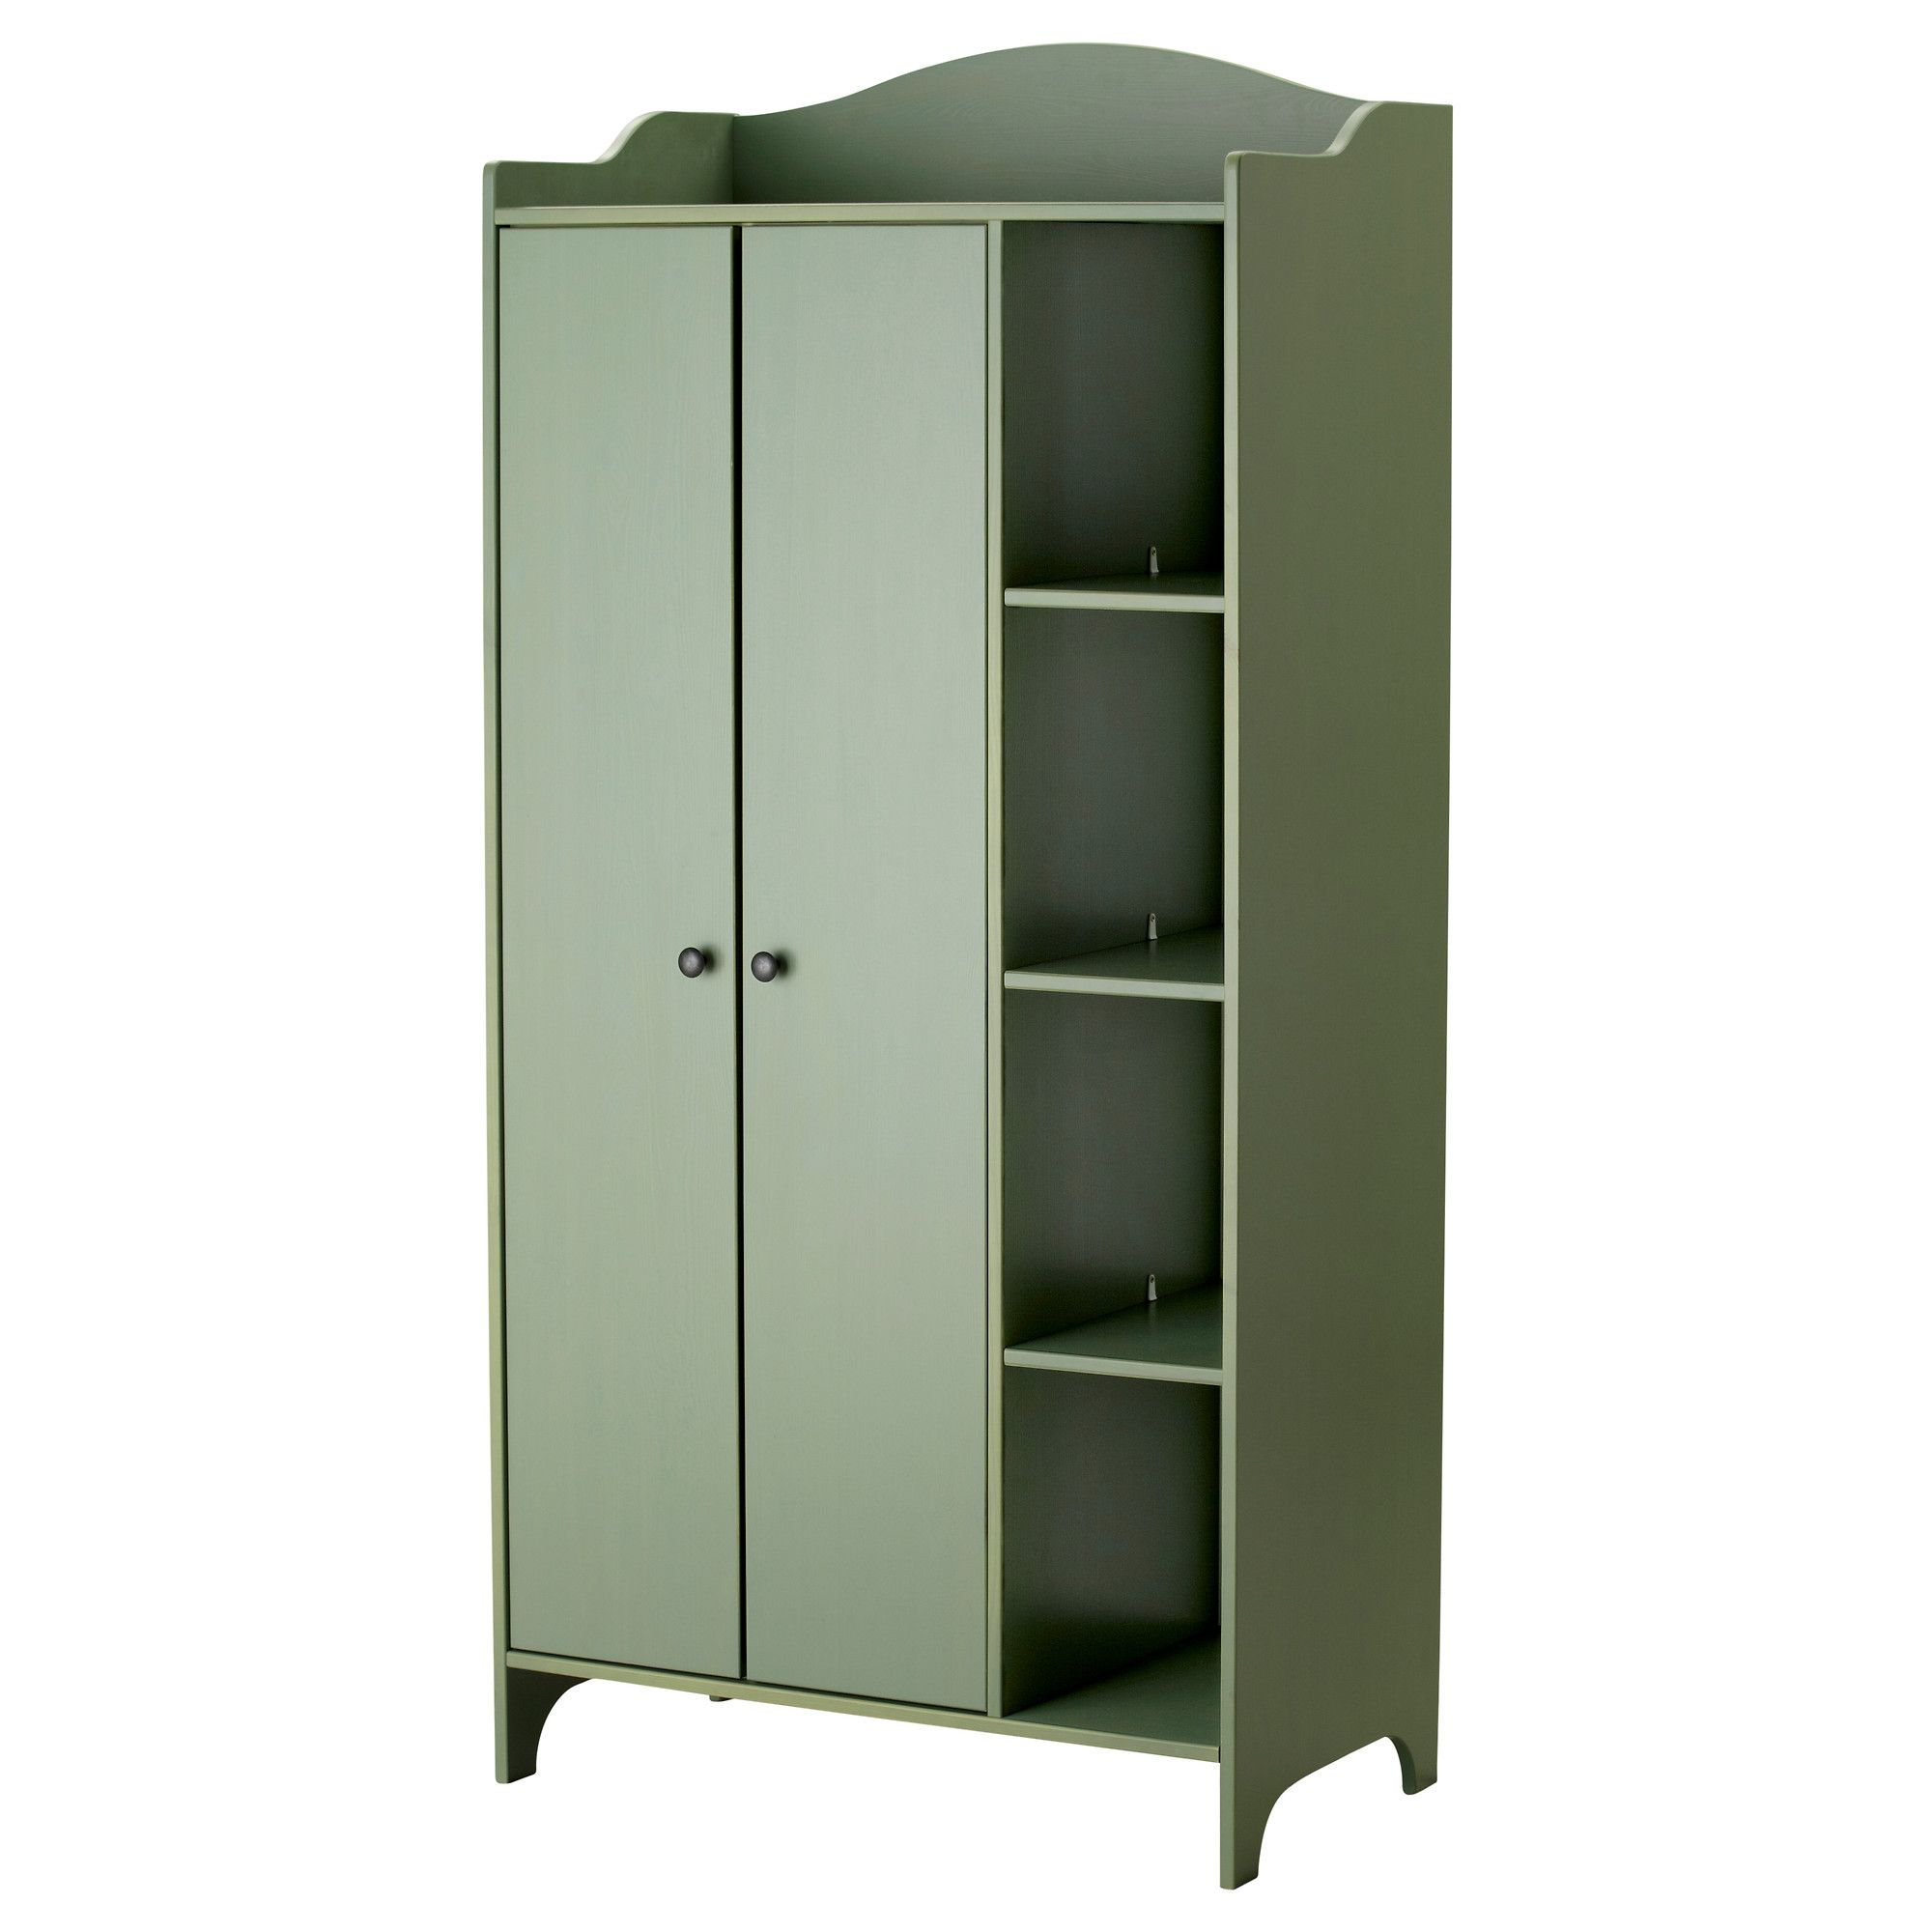 TROGEN Guardaroba - IKEA profondità 50cm, larghezza 89cm ...